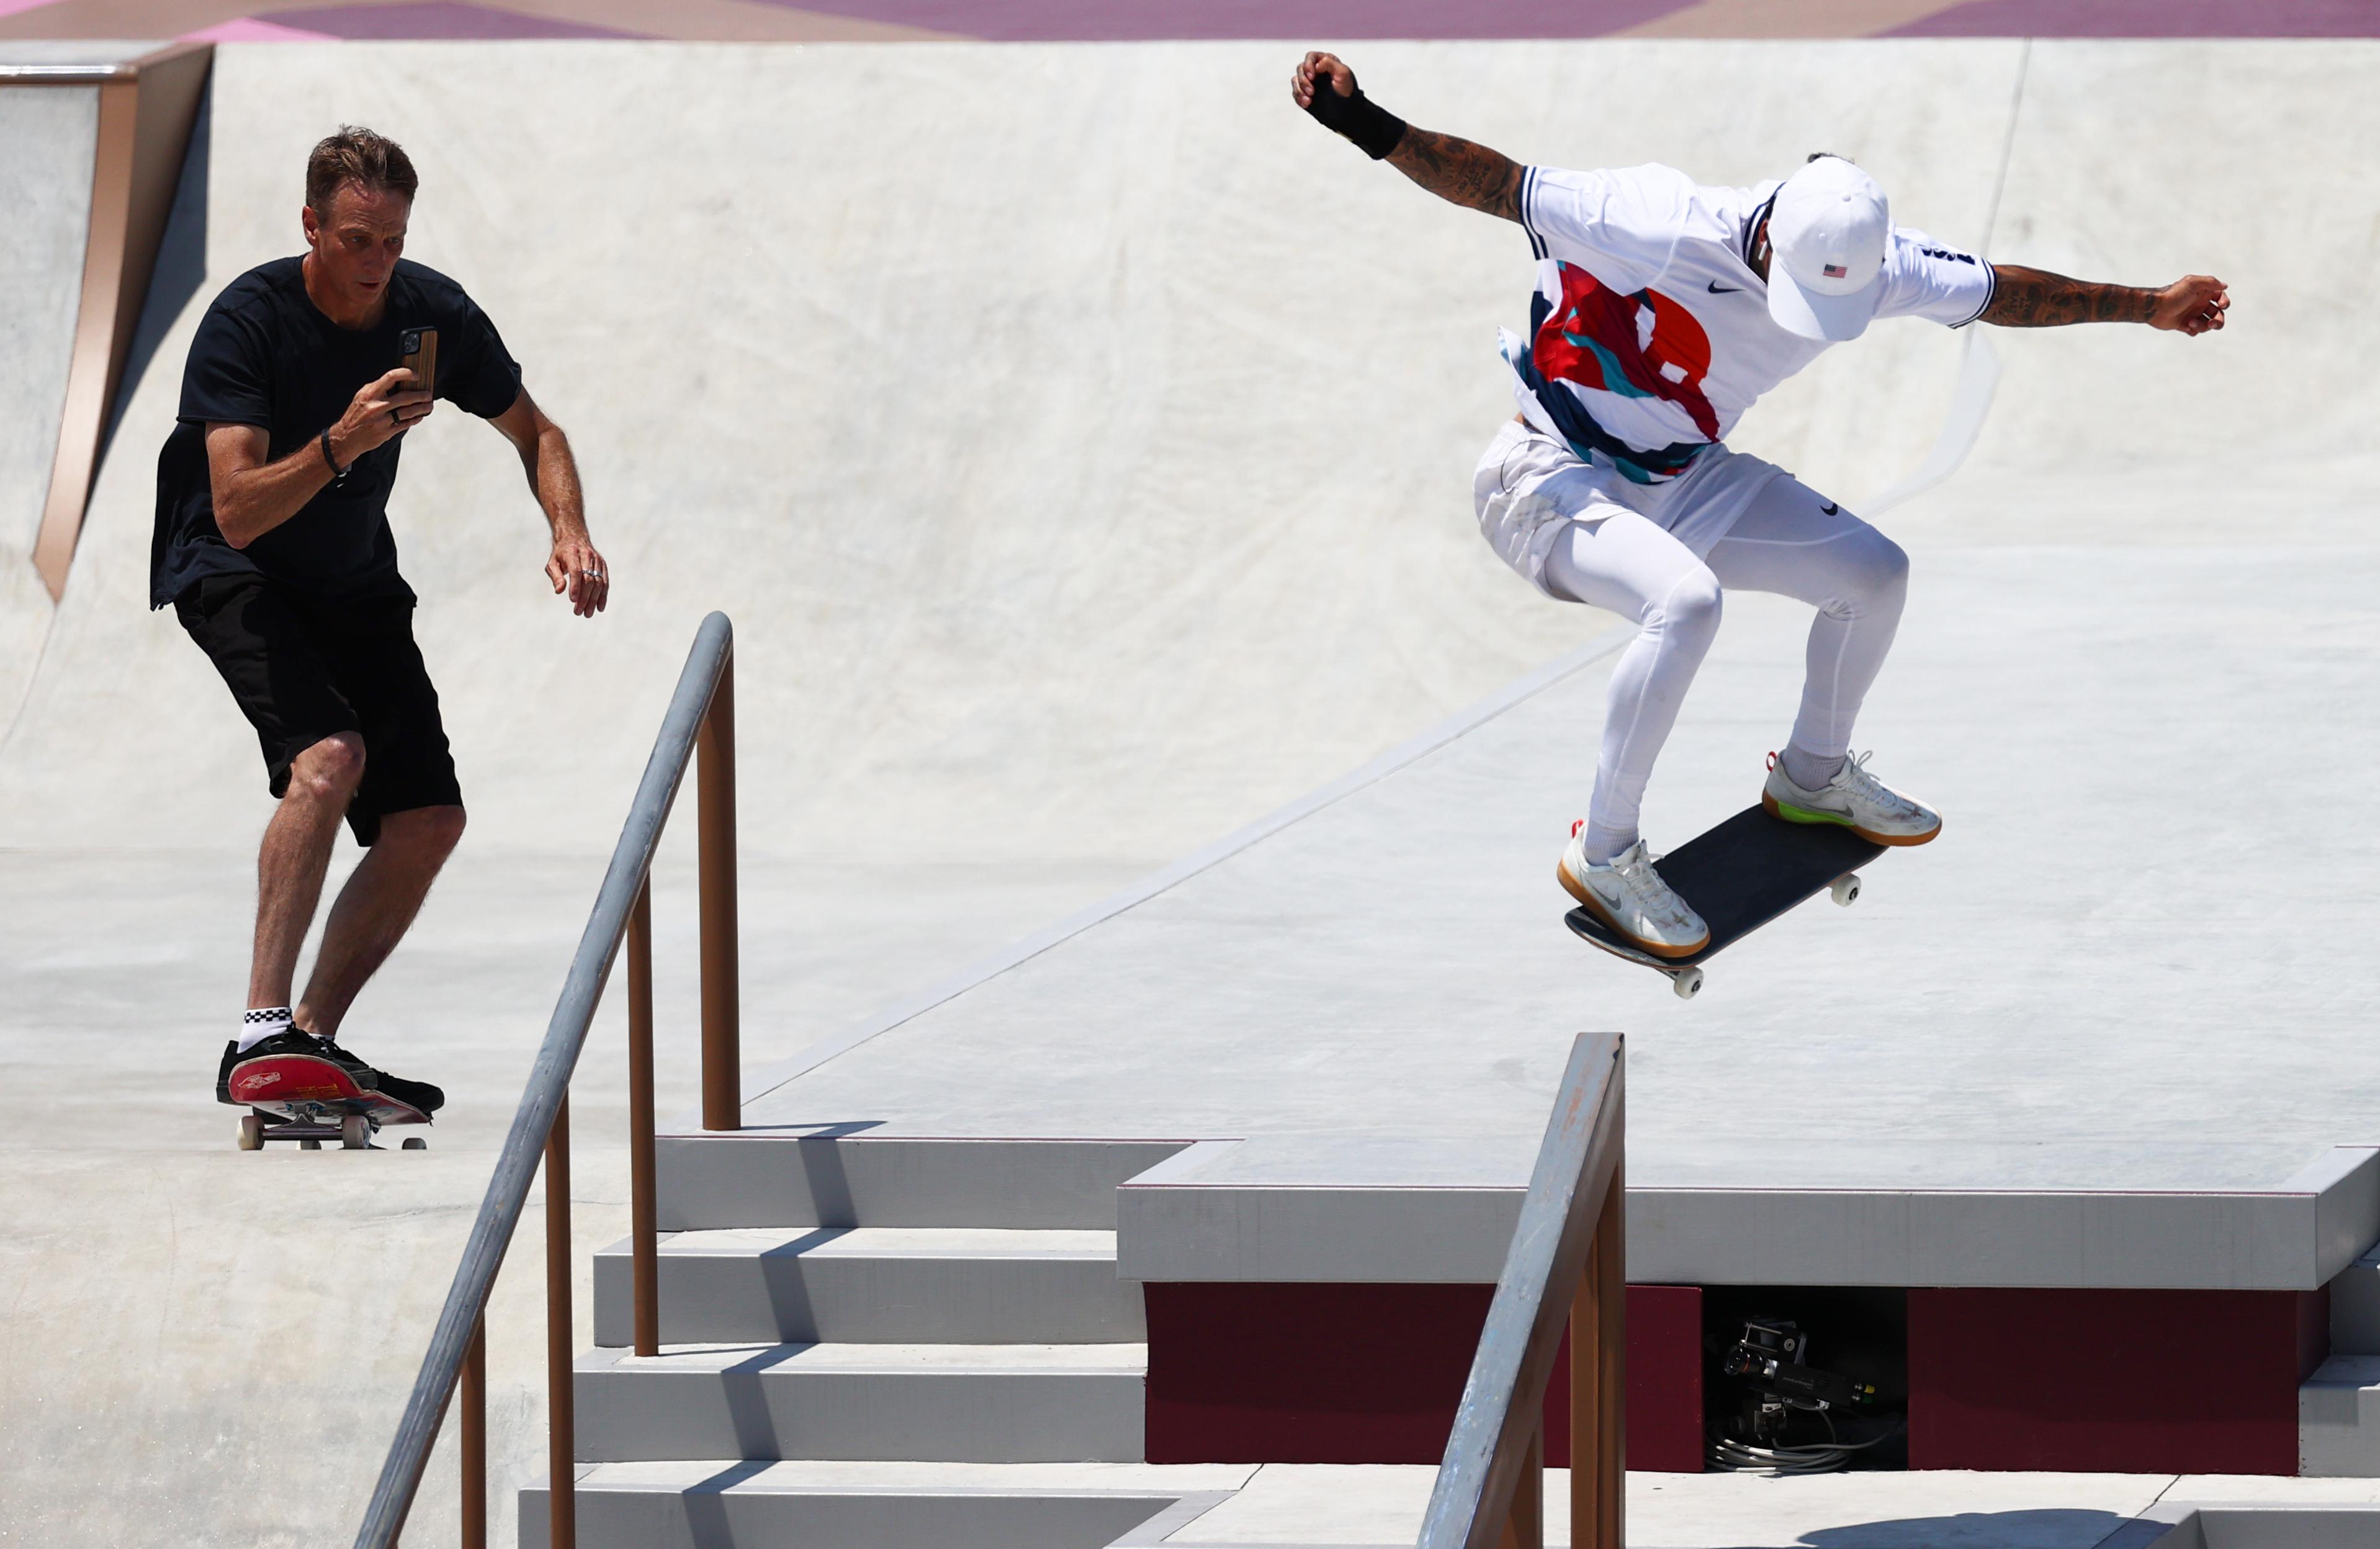 Tokyo 2020 Olympics - Skateboarding Training Session - Ariake Urban Sports Park, Tokyo, Japan - July 24, 2021. Tony Hawk films Nyjah Huston of the United States during training REUTERS/Lucy Nicholson